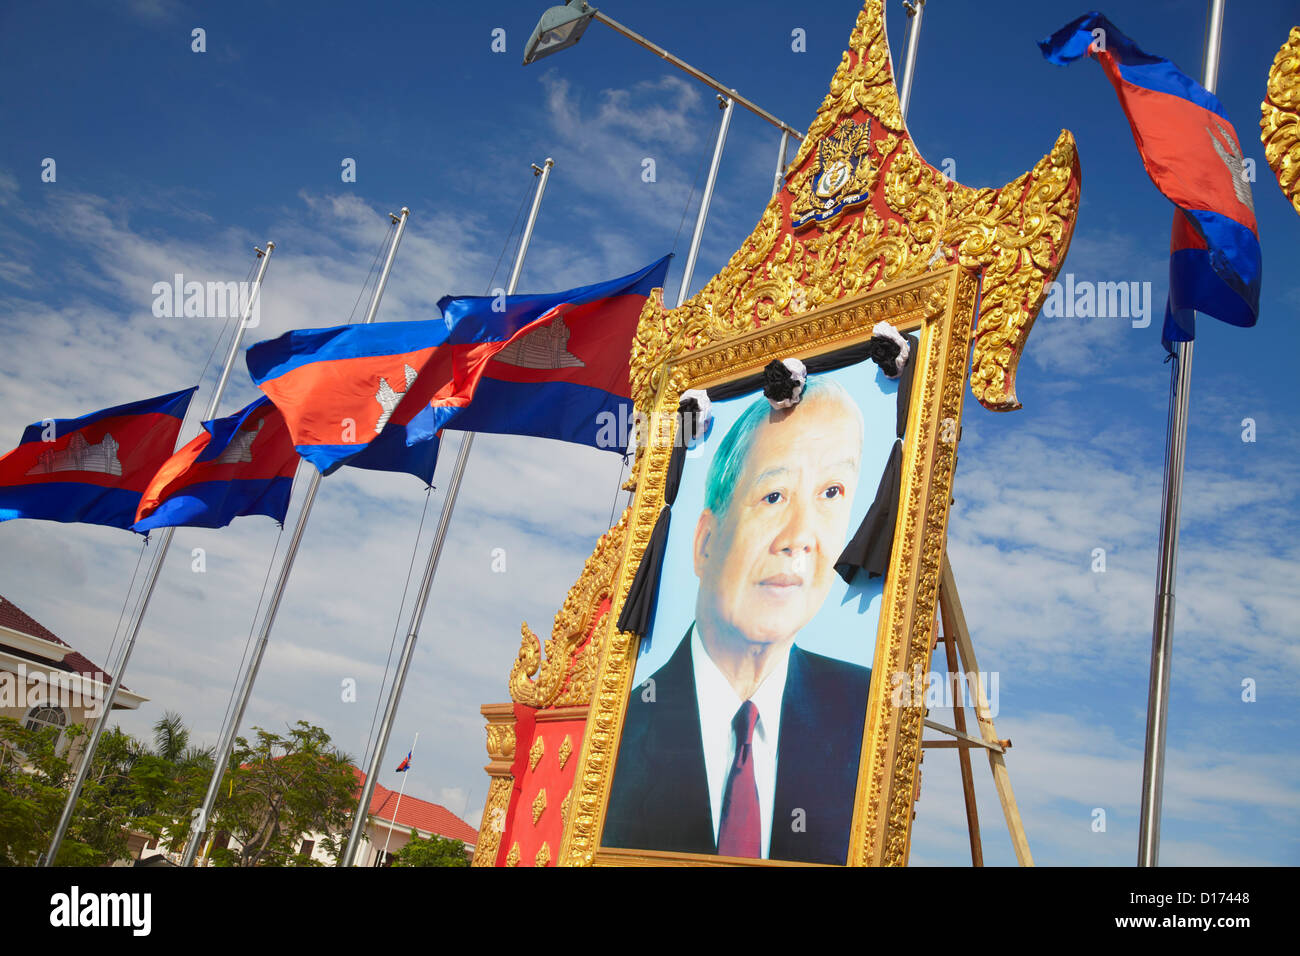 Memorial to the late King Norodom Sihanouk, Phnom Penh, Cambodia Stock Photo